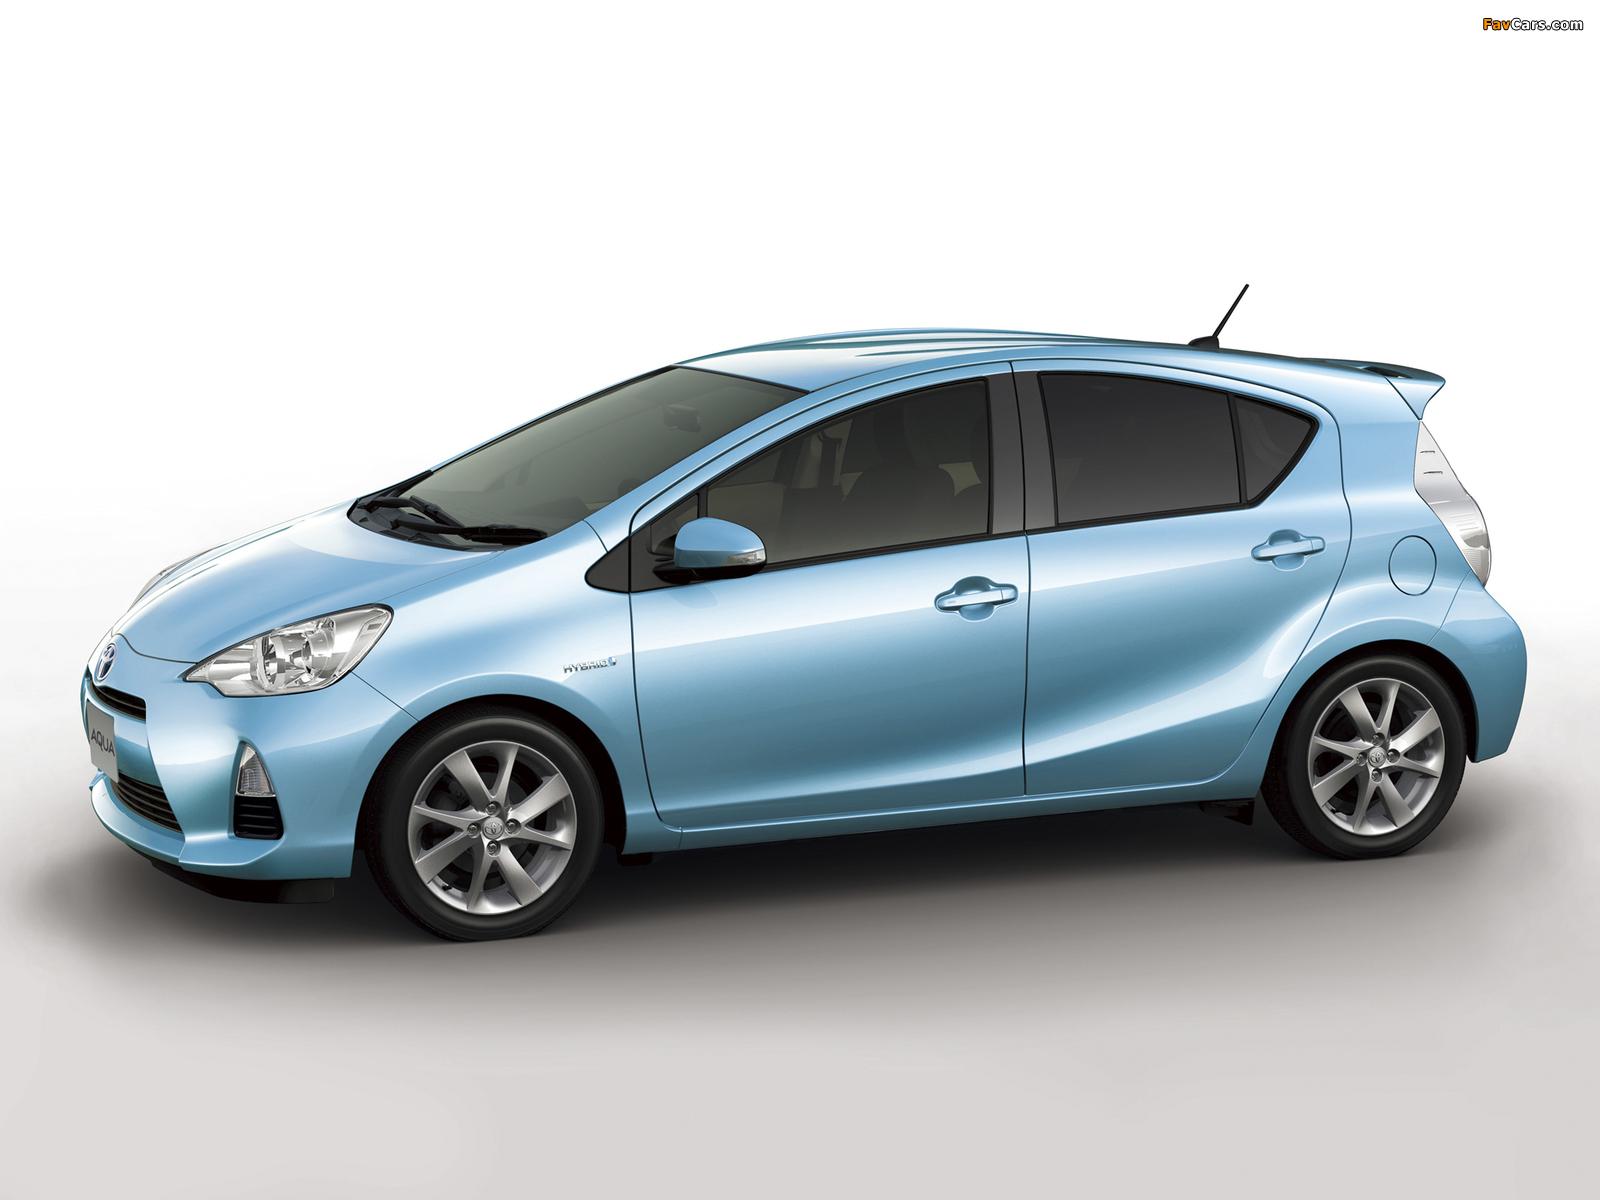 Toyota Aqua 2012 Images 1600x1200